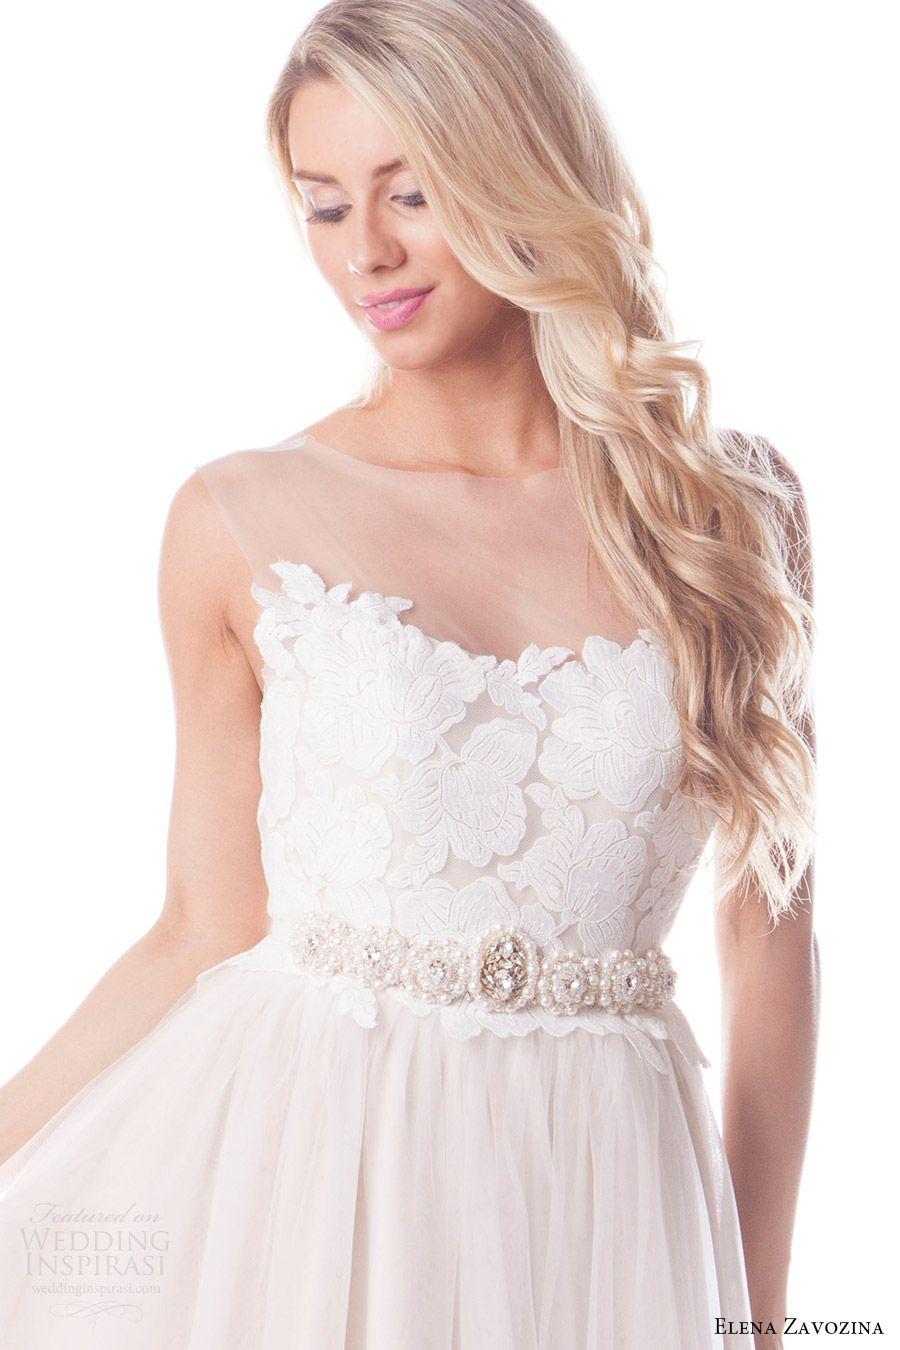 Elena Zavozina Wedding Accessories   Wedding accessories, Weddings ...